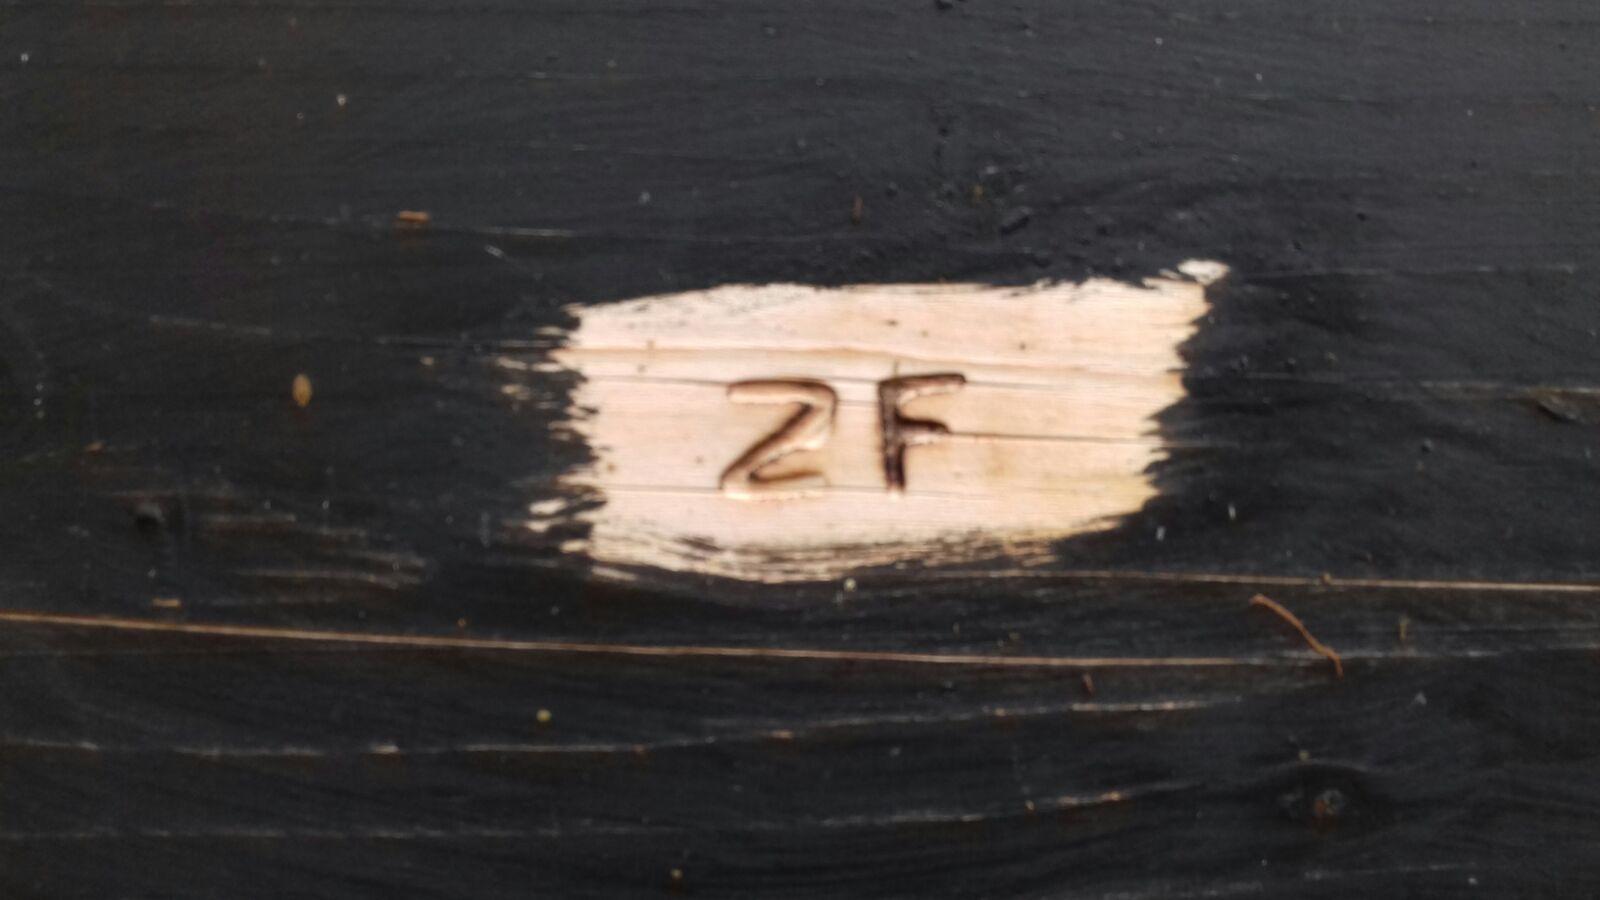 furto-zonta-20182